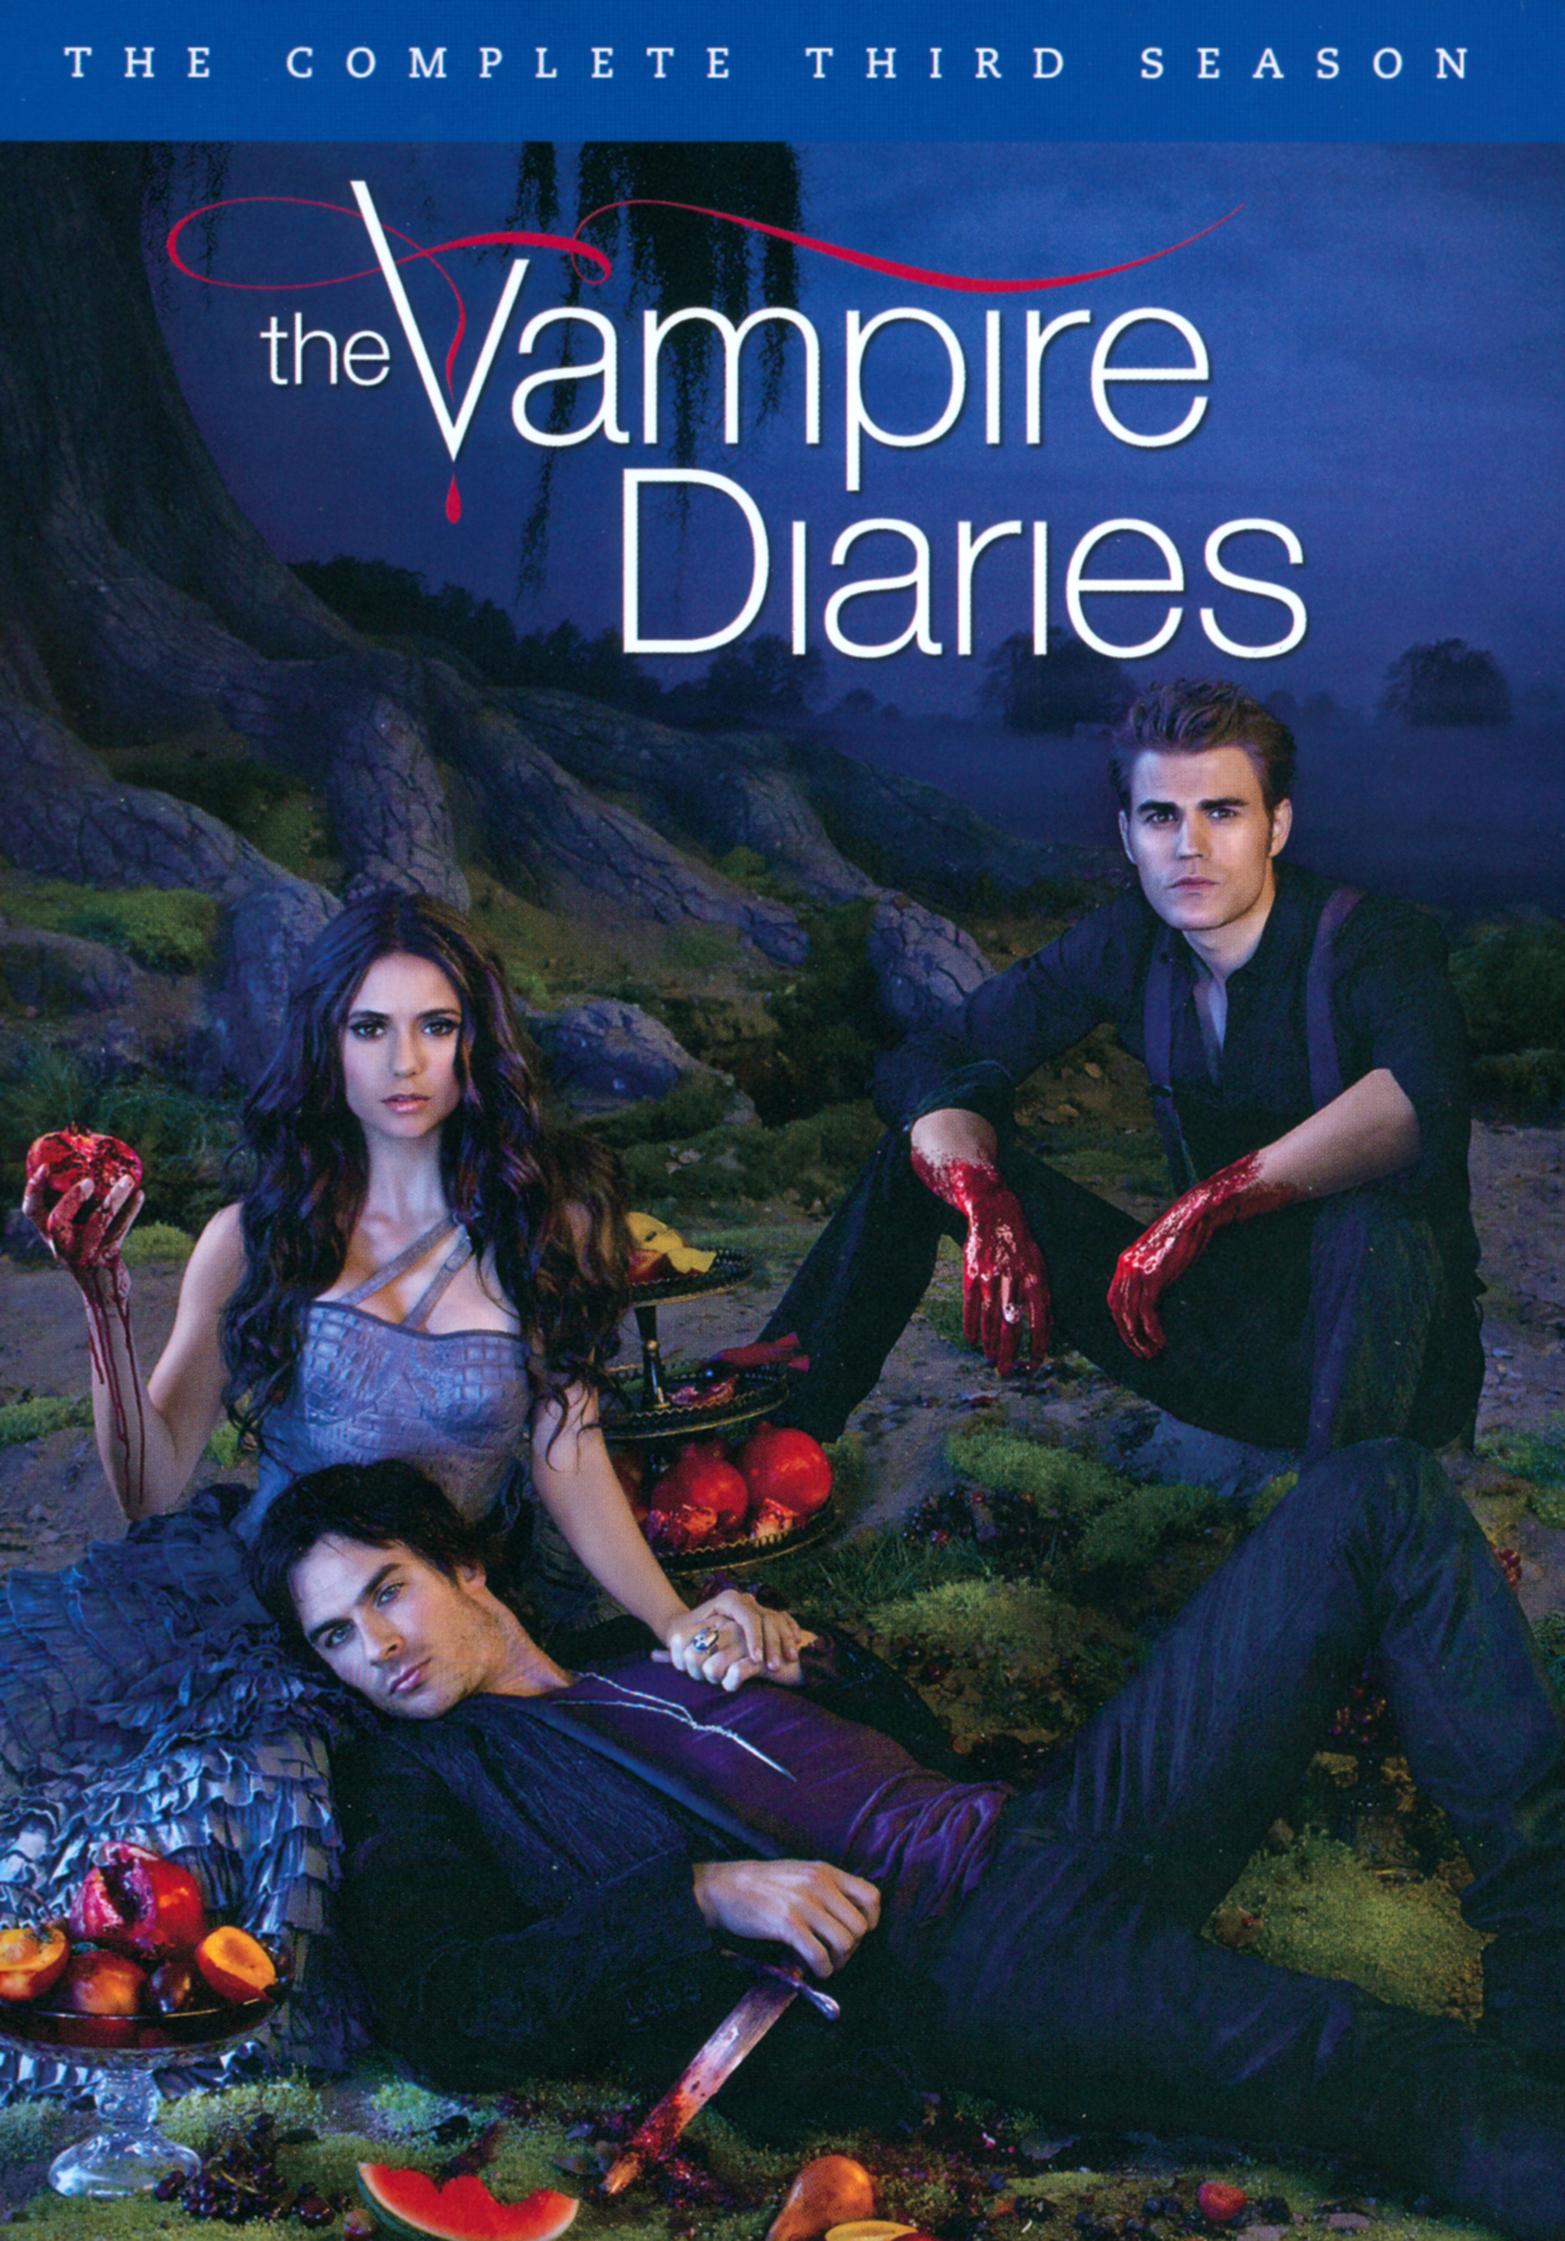 The Vampire Diaries: The Complete Third Season [5 Discs] (dvd) 6502535